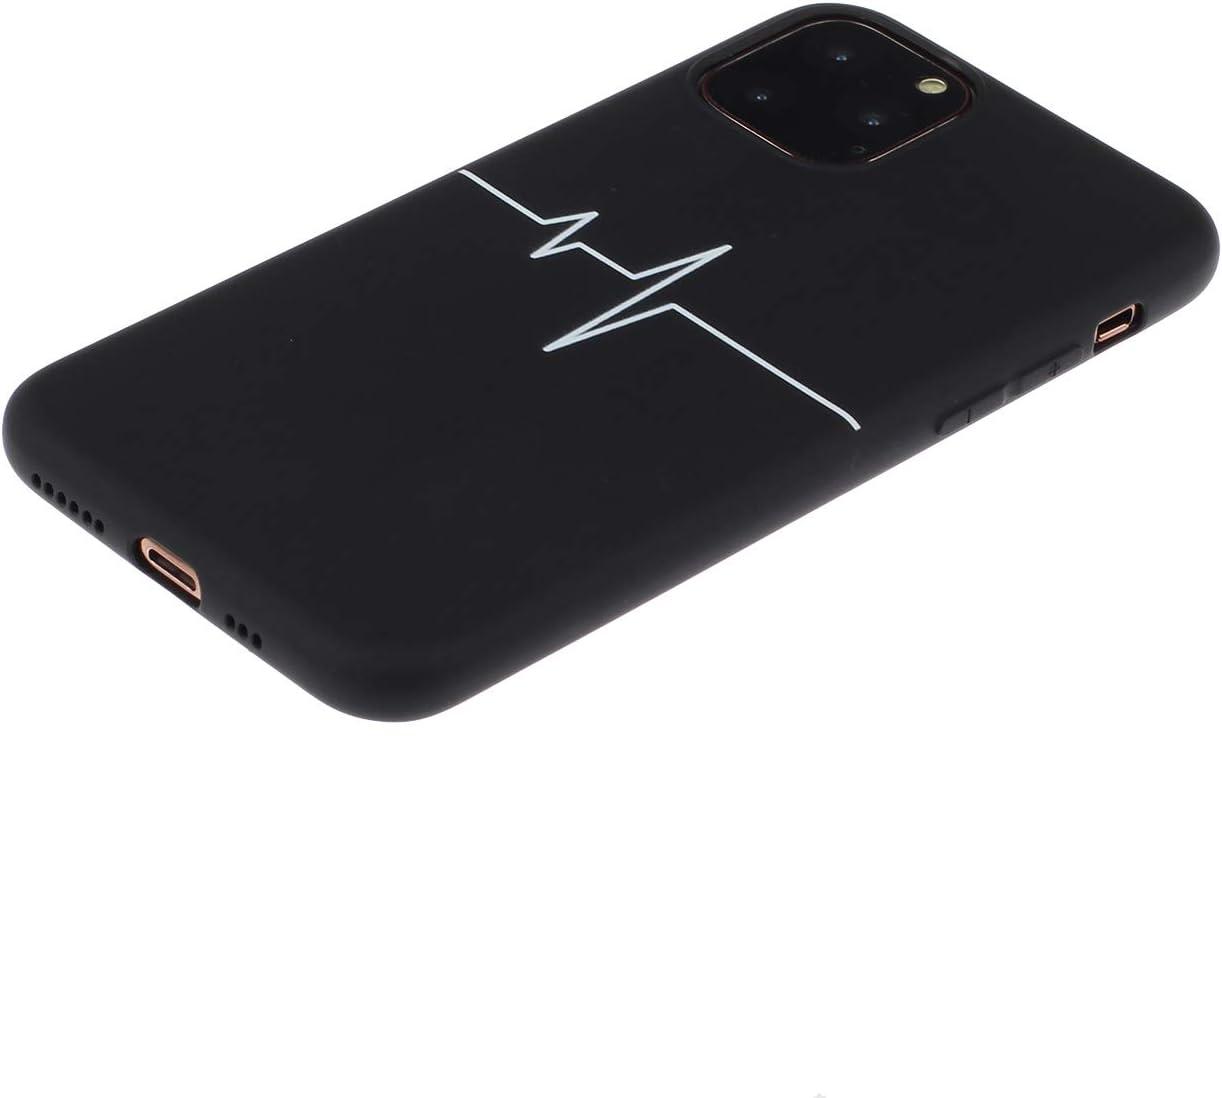 MoreChioce kompatibel mit iPhone 11 Pro Max H/ülle,kompatibel mit iPhone 11 Pro Max Handyh/ülle Silikon Einfarbig,Durchsichtig Crystal Case Defender Bumper,Sch/ön Tiefes Blau Silikonh/ülle Sto/ßfest Etui